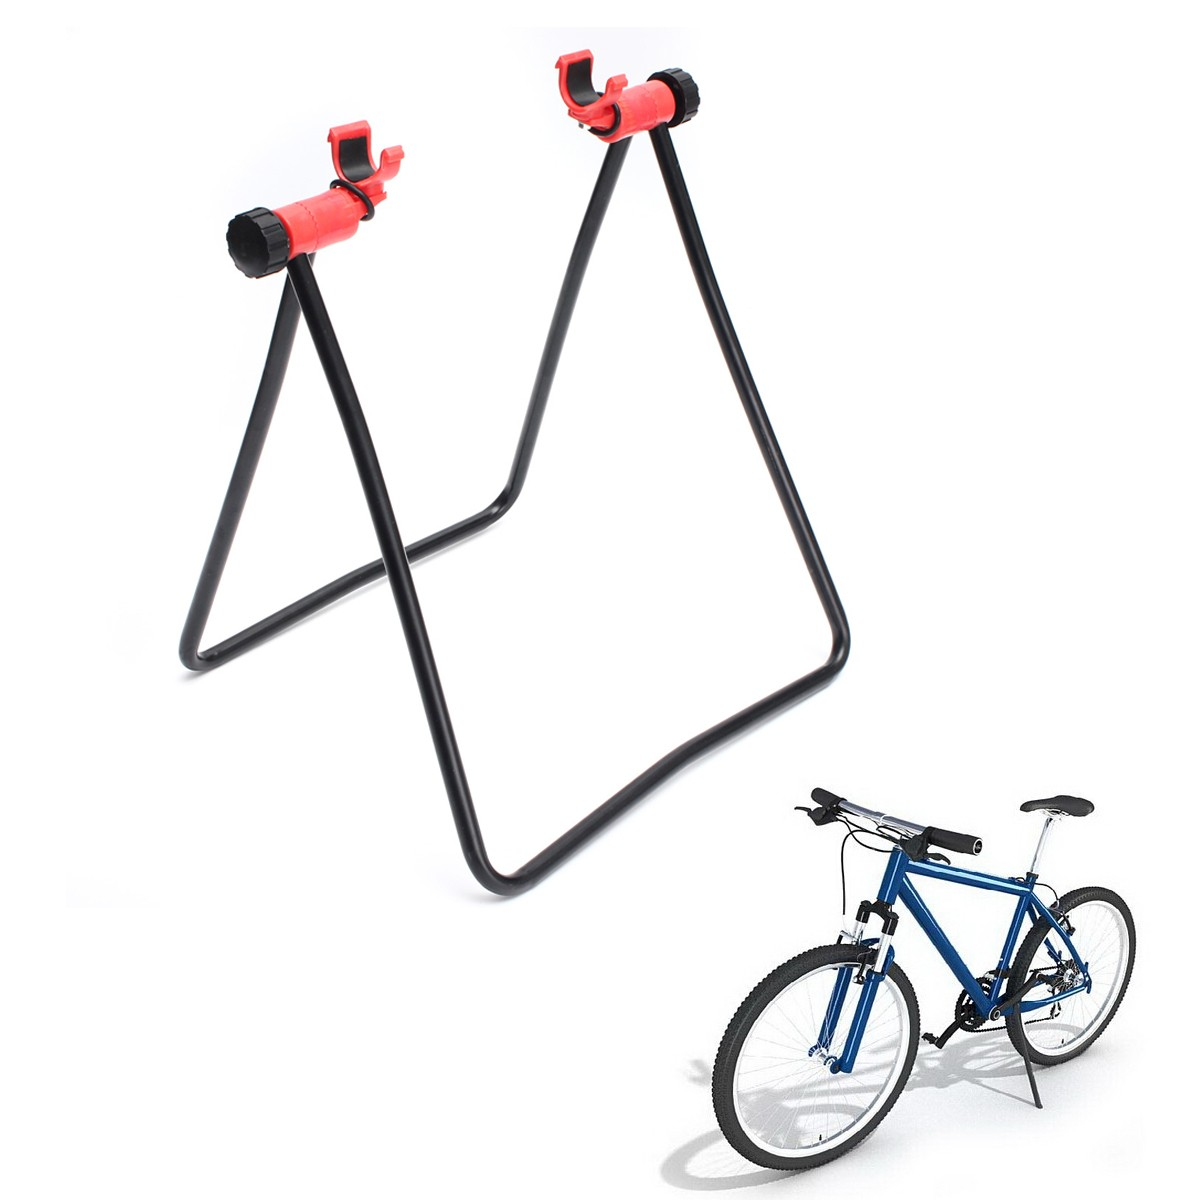 New Adjustable Bicycle Parking Kickstand Foldind MTB Road